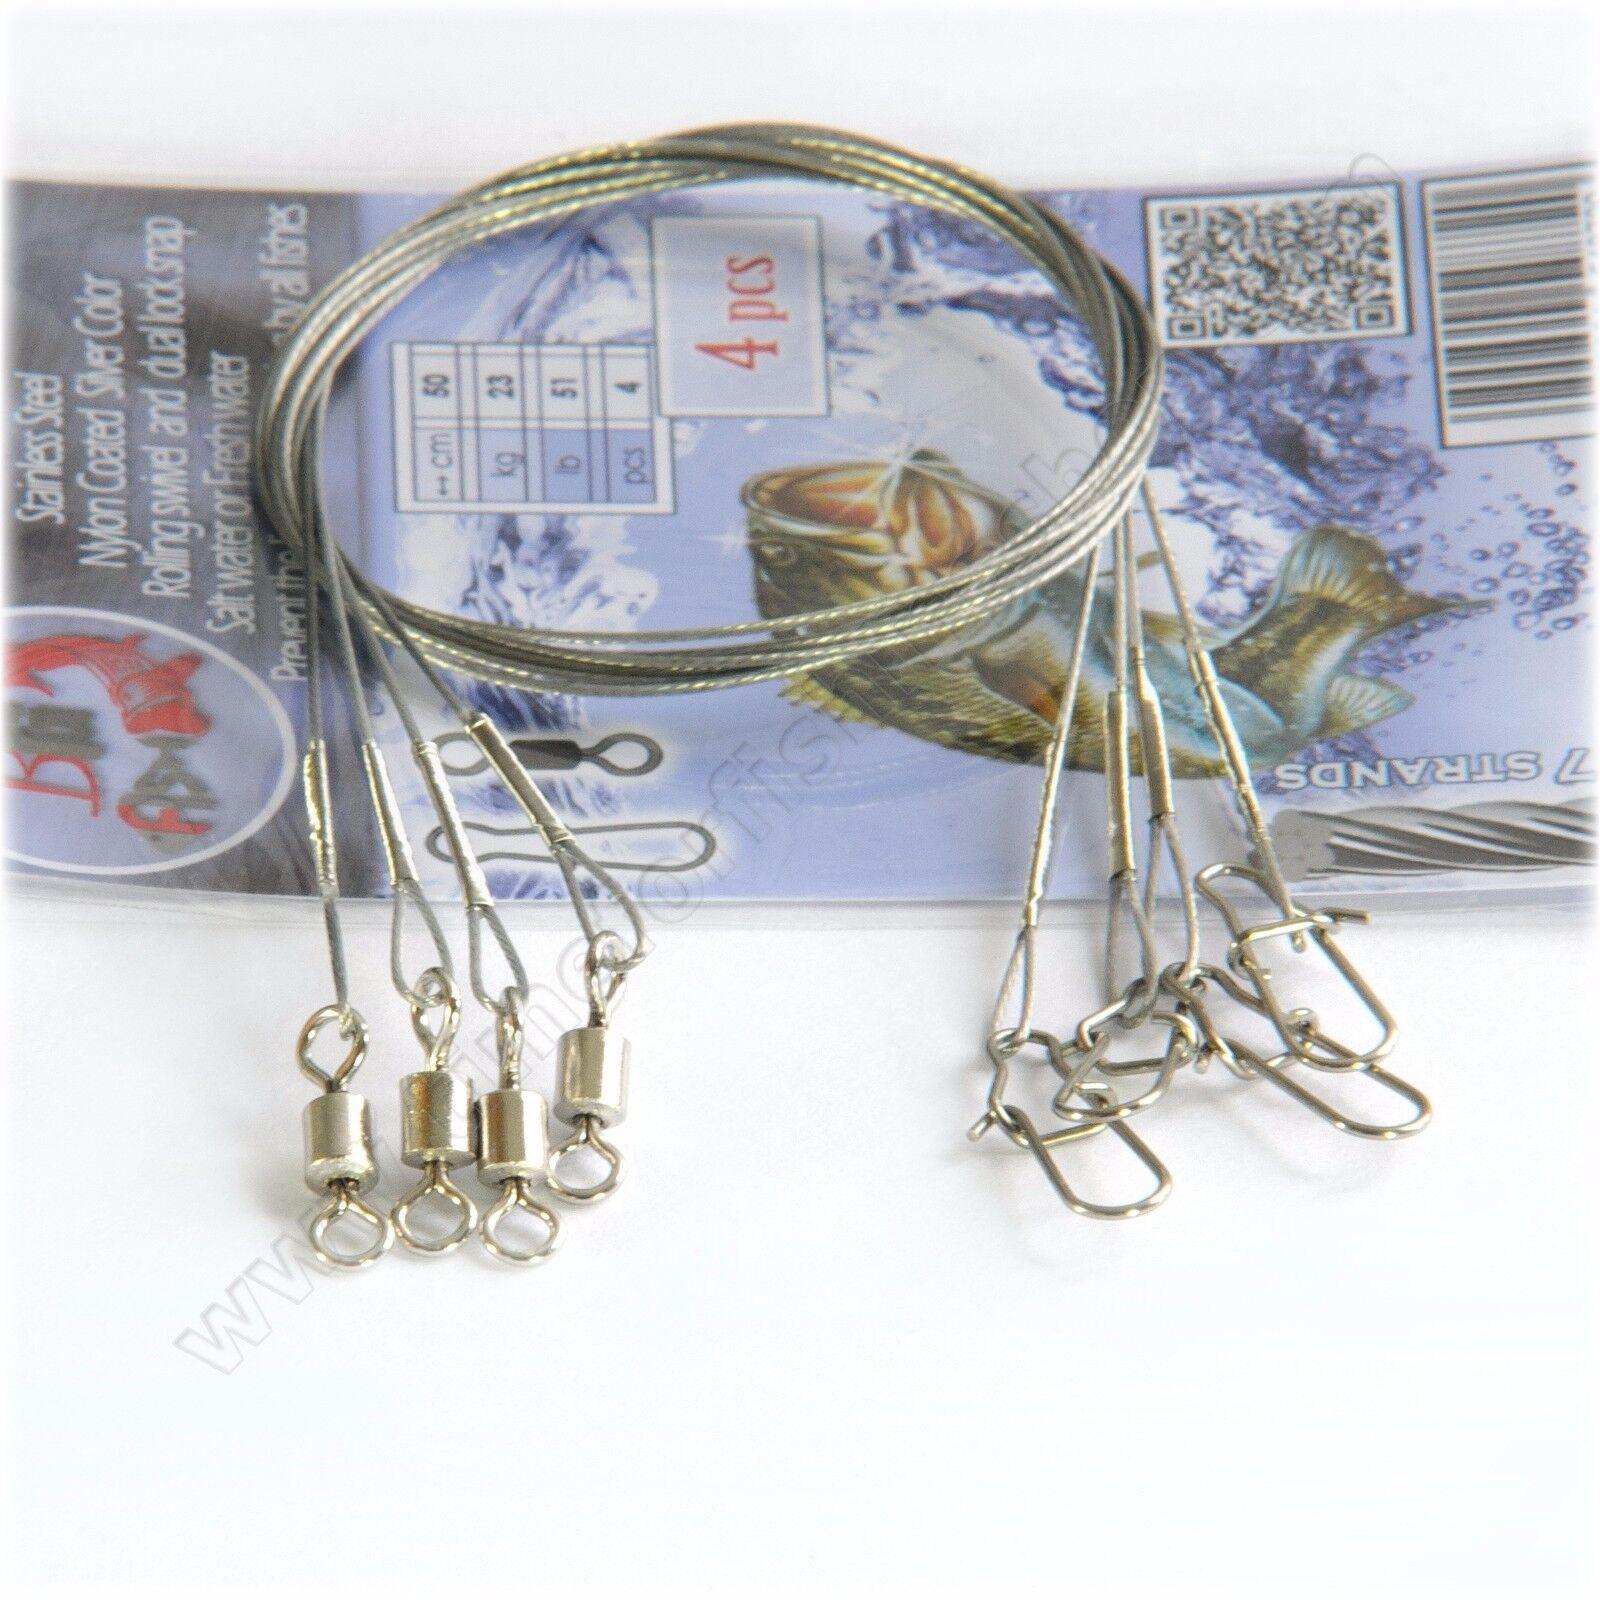 50Pcs Carp Fishing Bait Accessories Hook Sleeve Hair Rig Soft Aligner Sleev G8O7